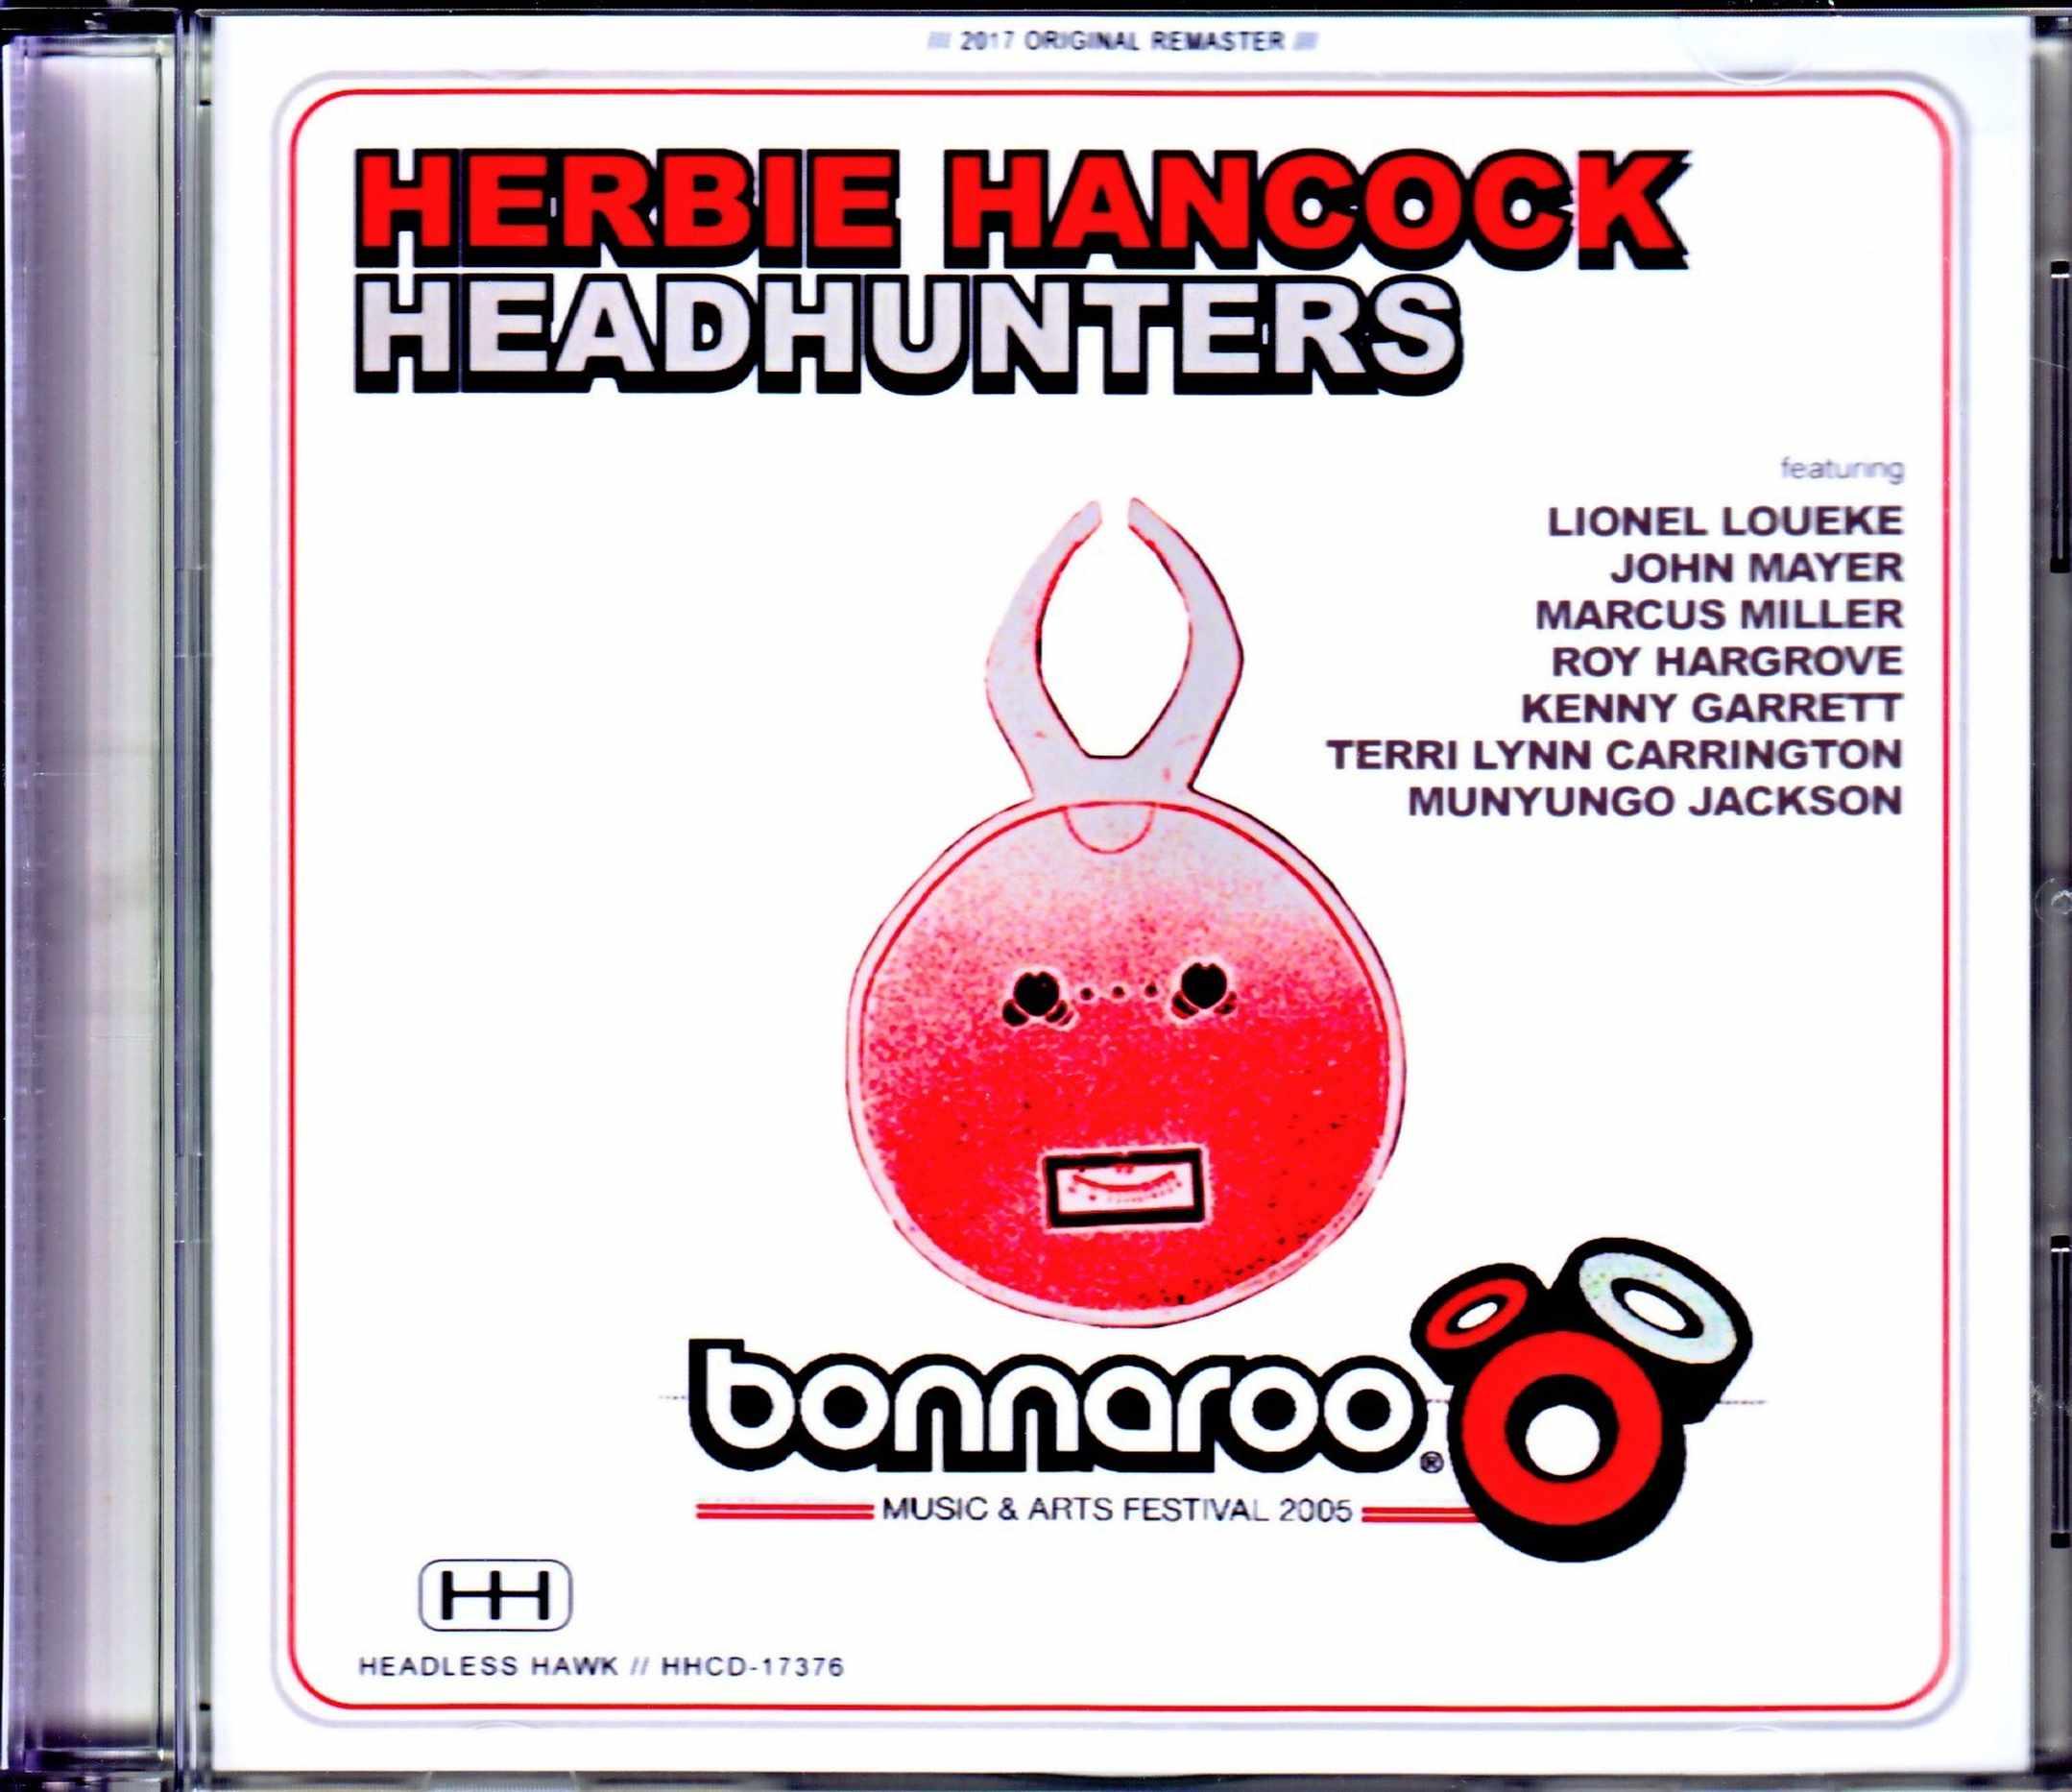 Herbie Hancock Headhunters,John Mayer,Marcus Miller ハービー・ハンコック/TN,USA 2005 & more